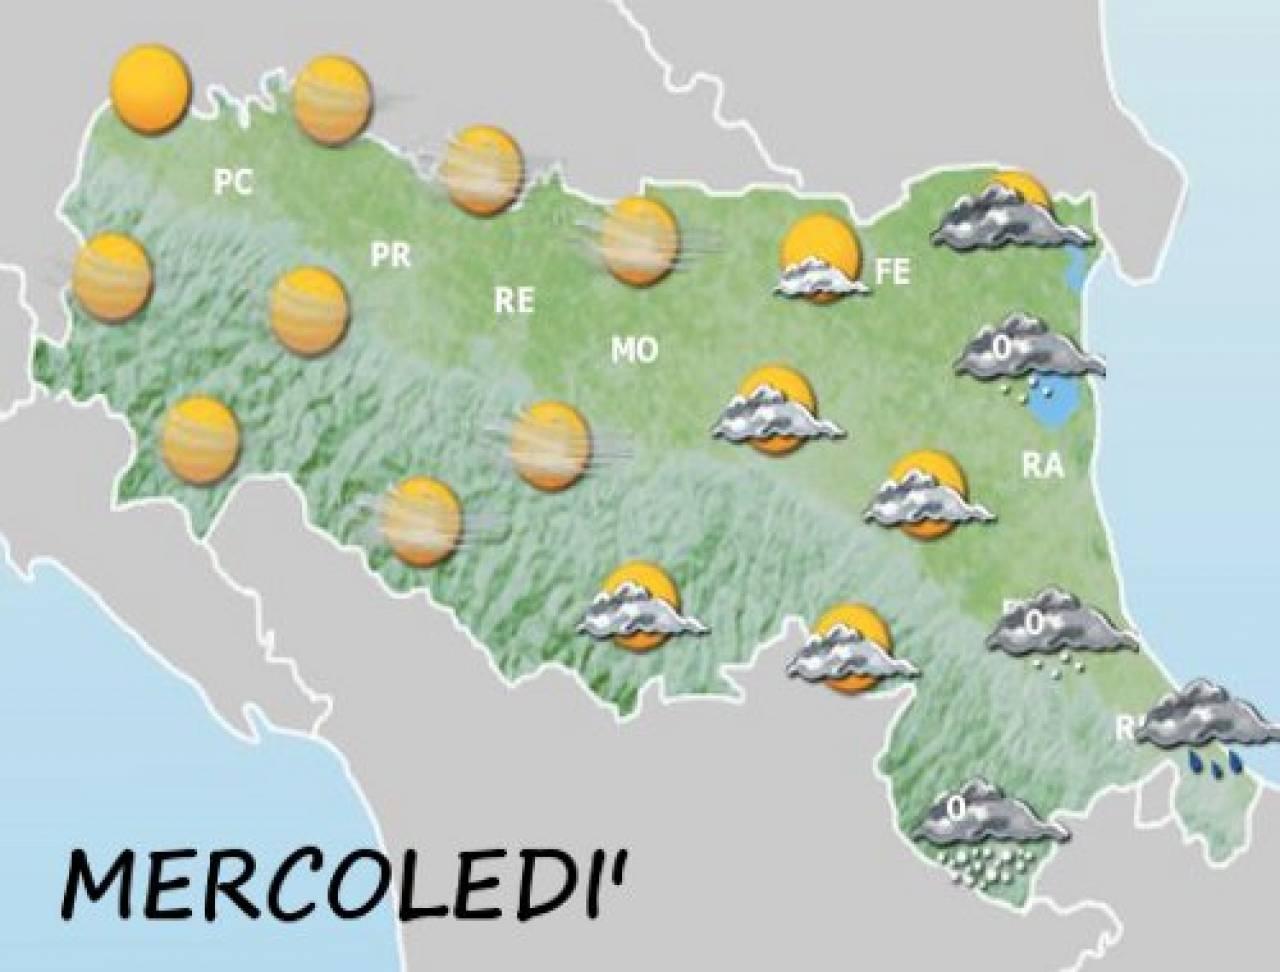 Meteo romagna forl e ravenna rovesci di neve in arrivo 3b meteo - Meteo it bagno di romagna ...